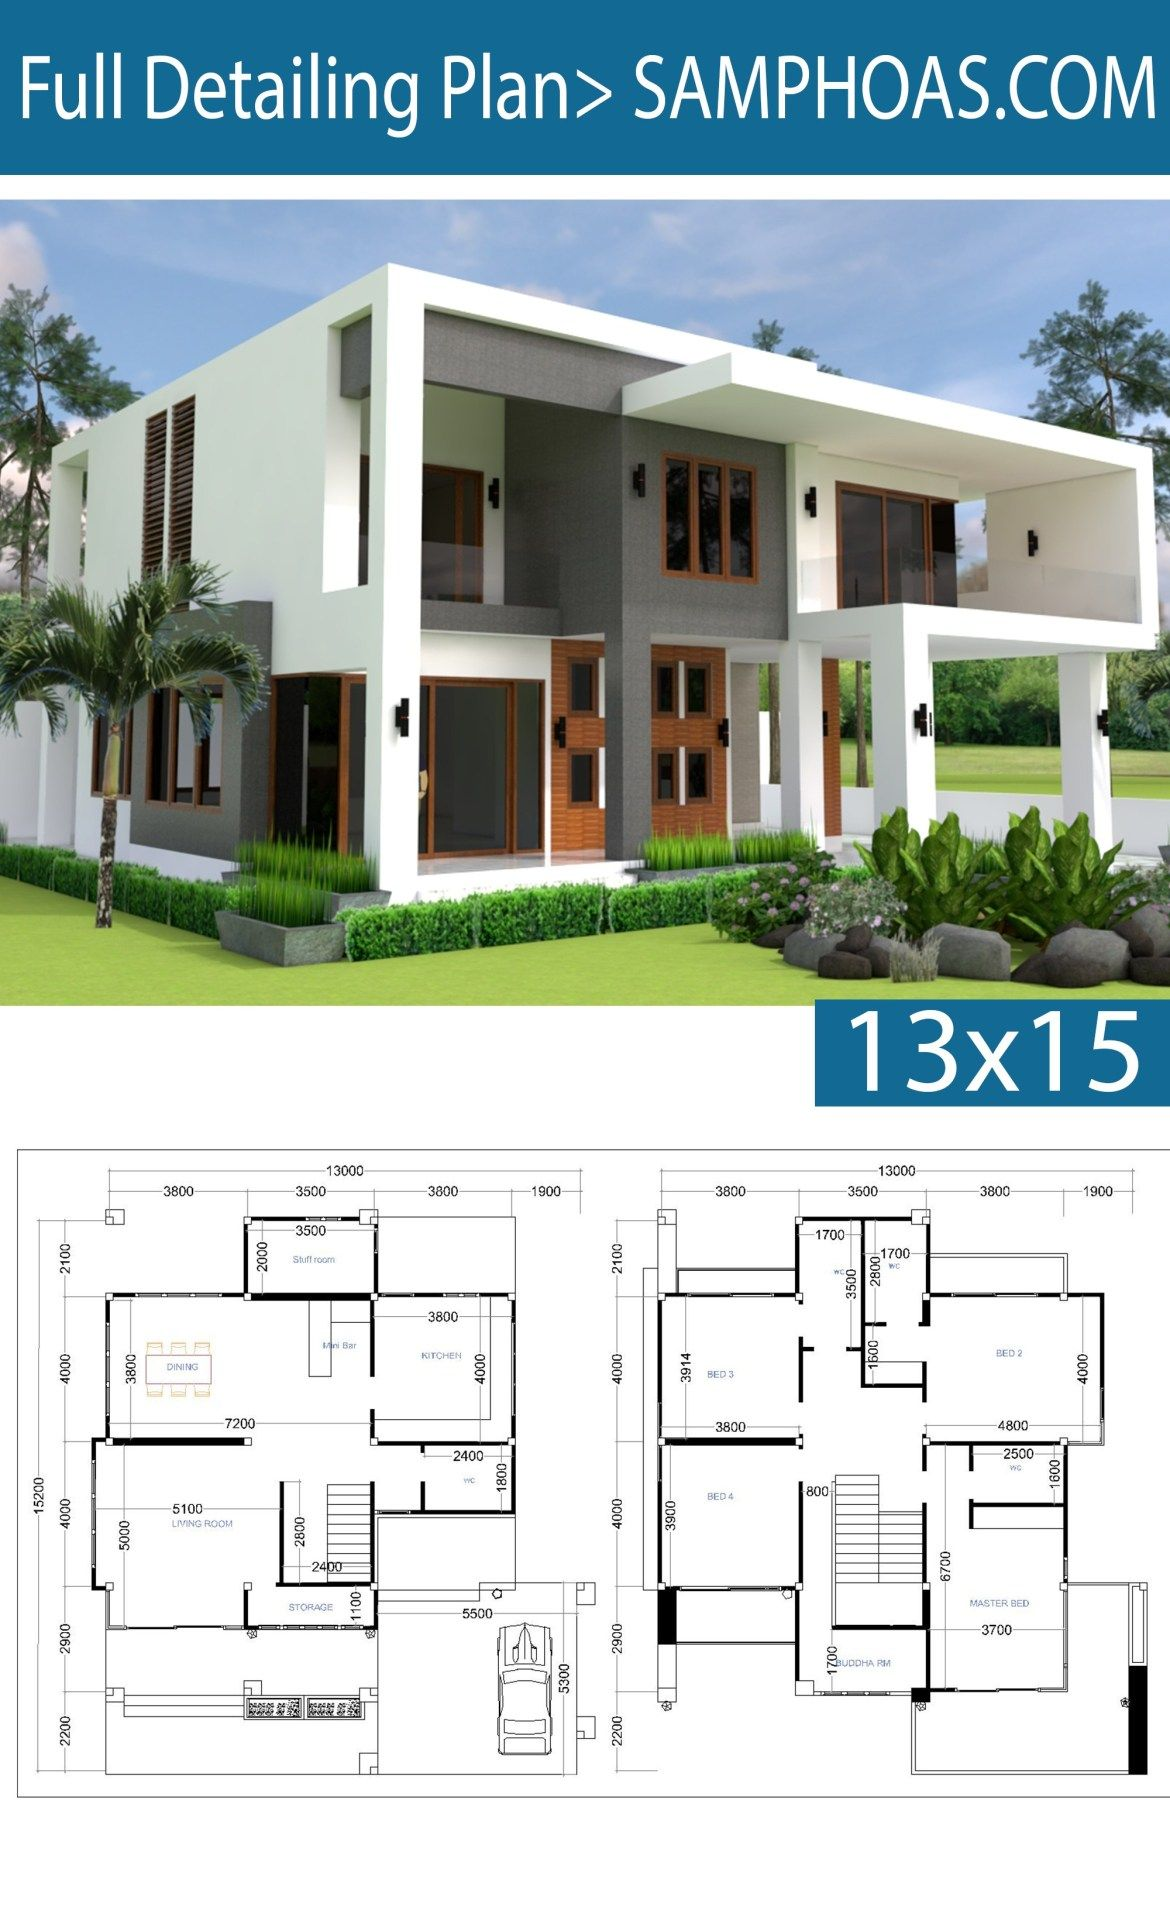 Modern 4 Bedrooms House Plan 13x13m Samphoas Plansearch 4 Bedroom House Plans Model House Plan Bungalow House Plans